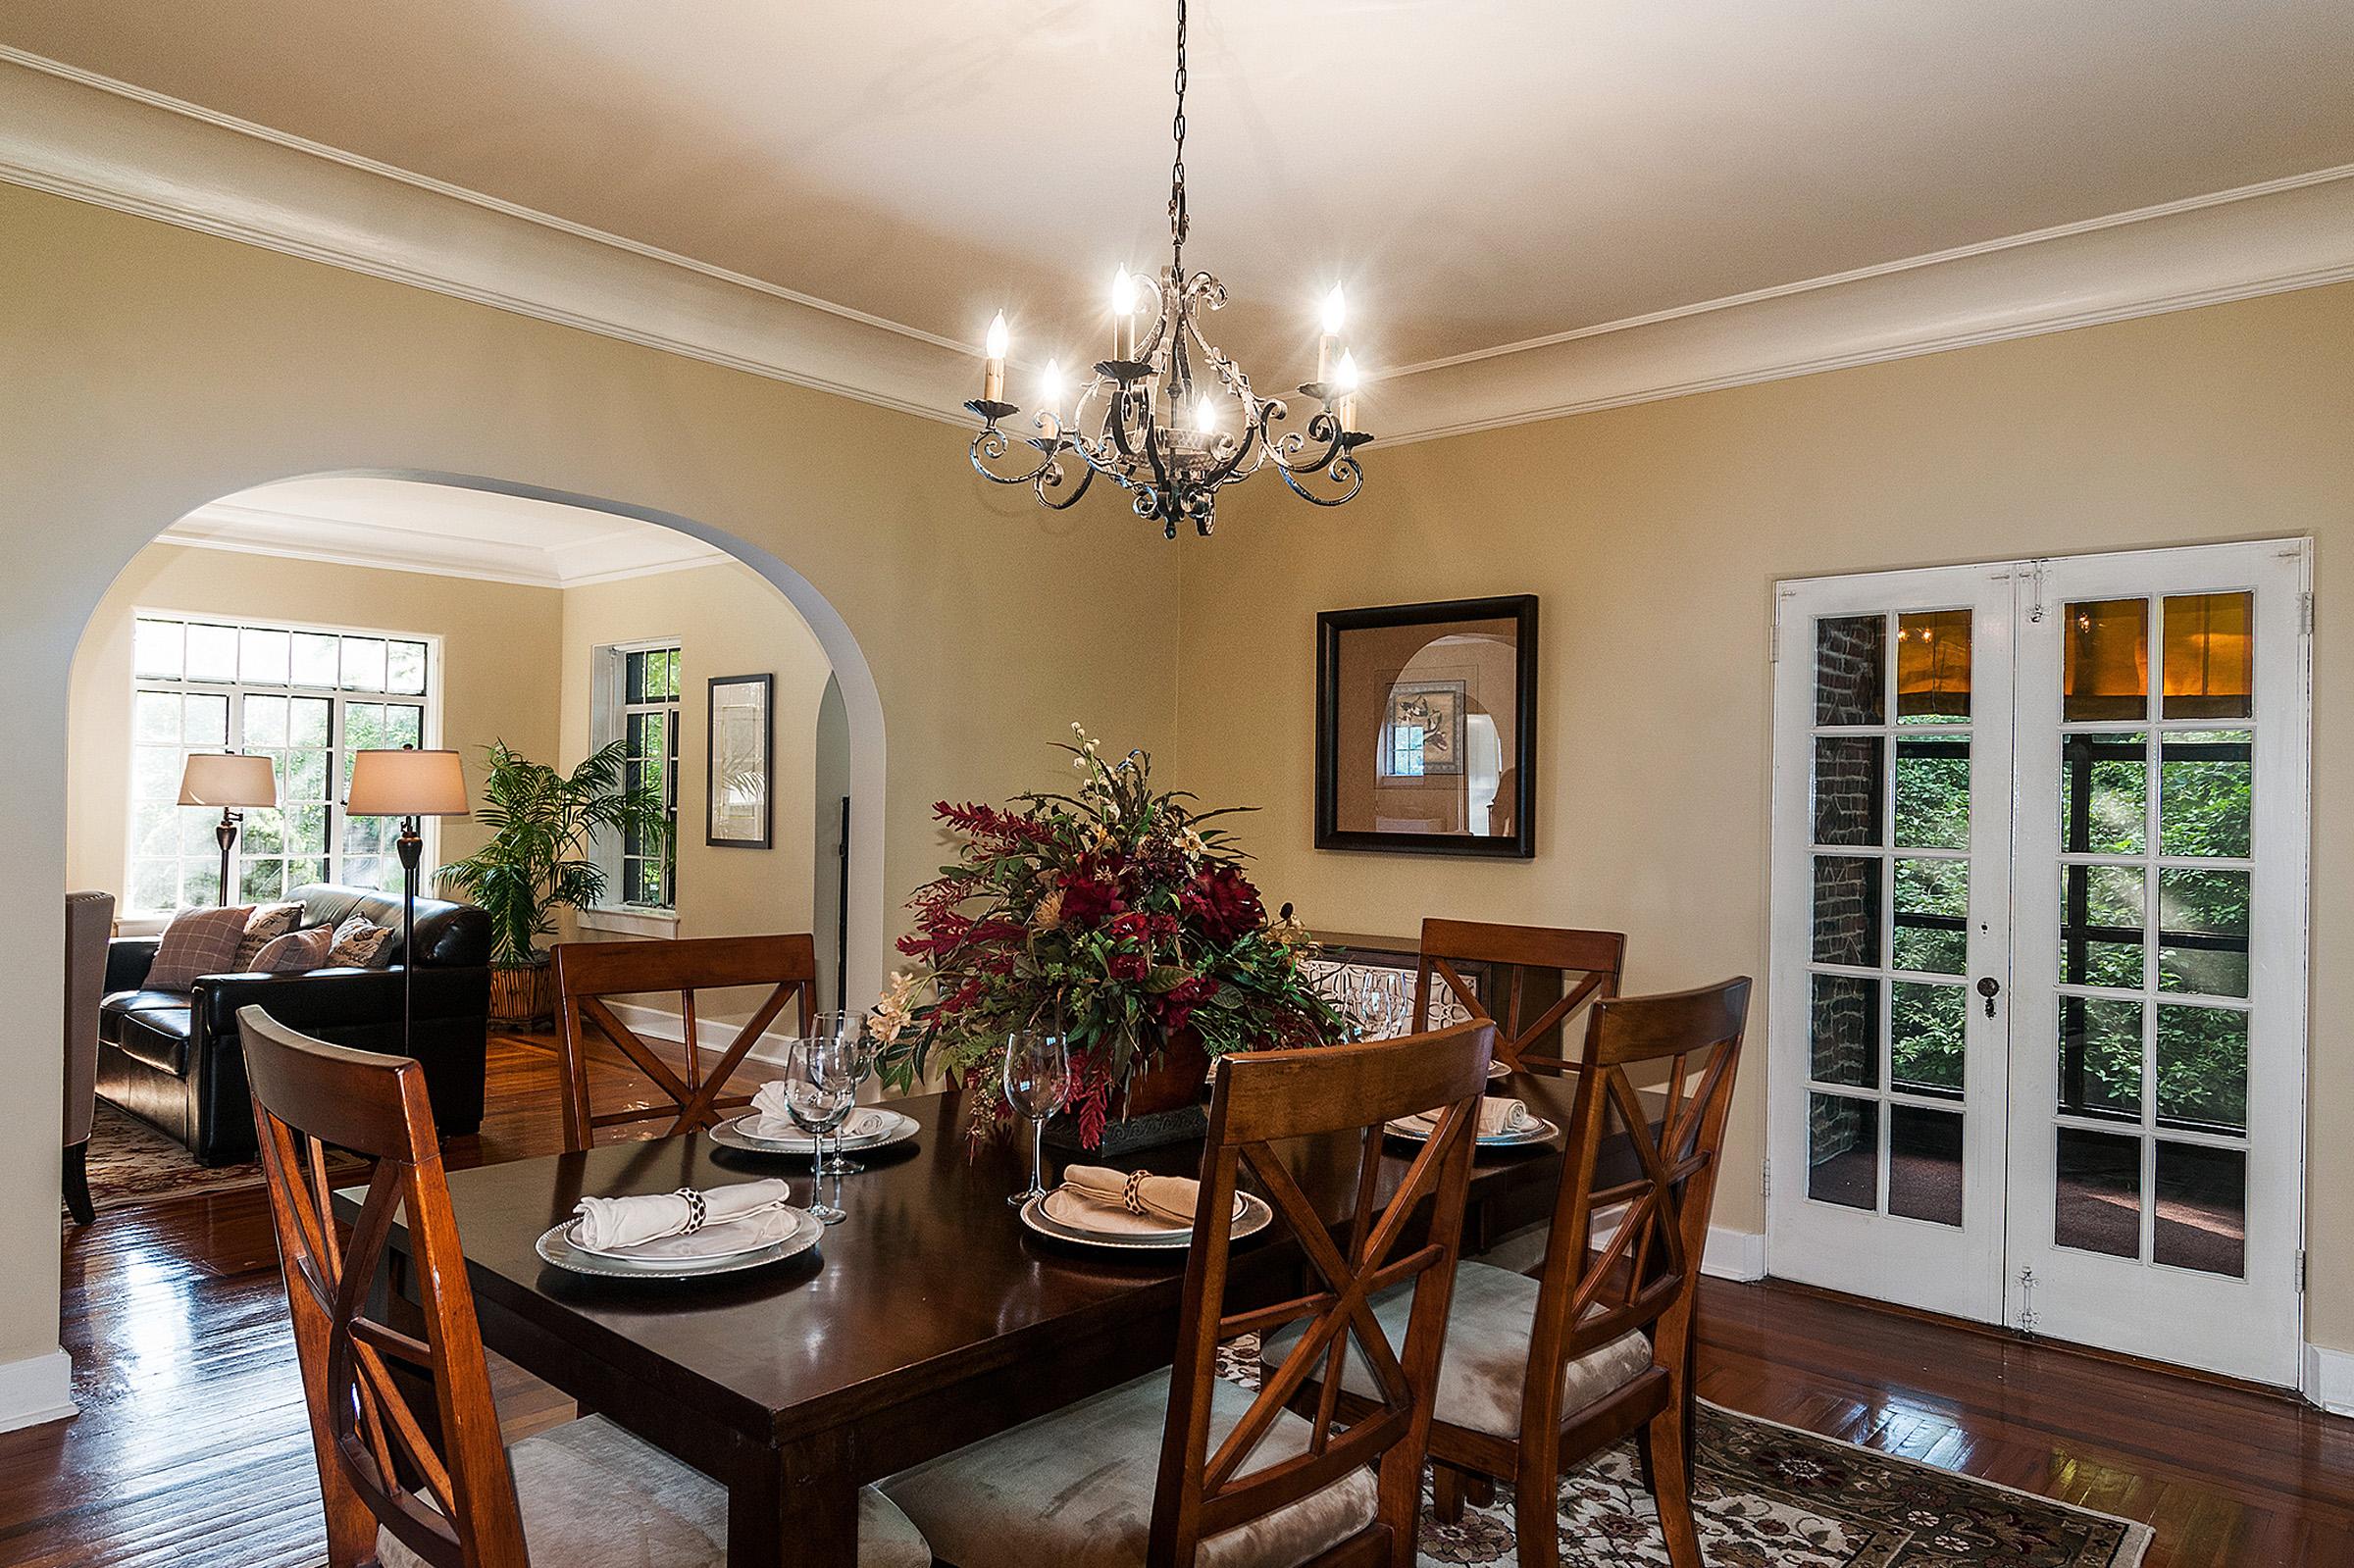 1087640_Dining-Room-has-Original-Iron-Chandelier_high.jpg